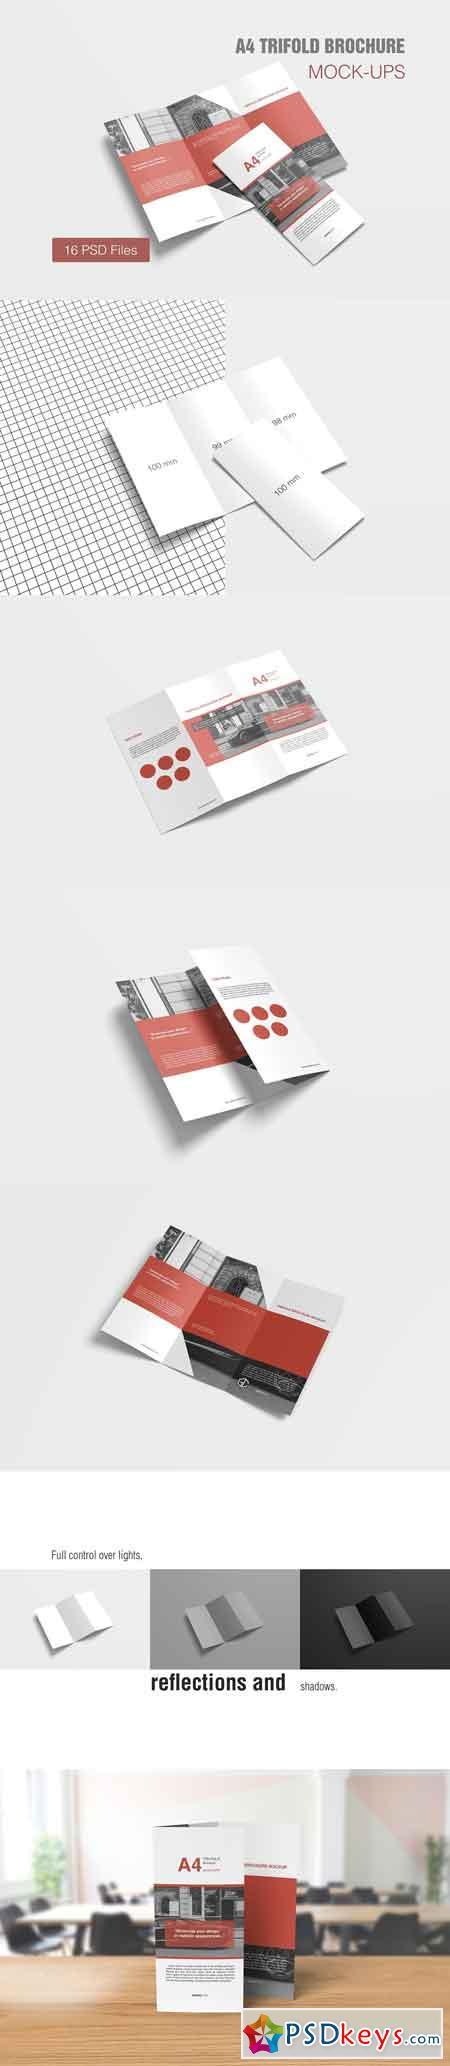 A4 Trifold Brochure Mockup 3134485